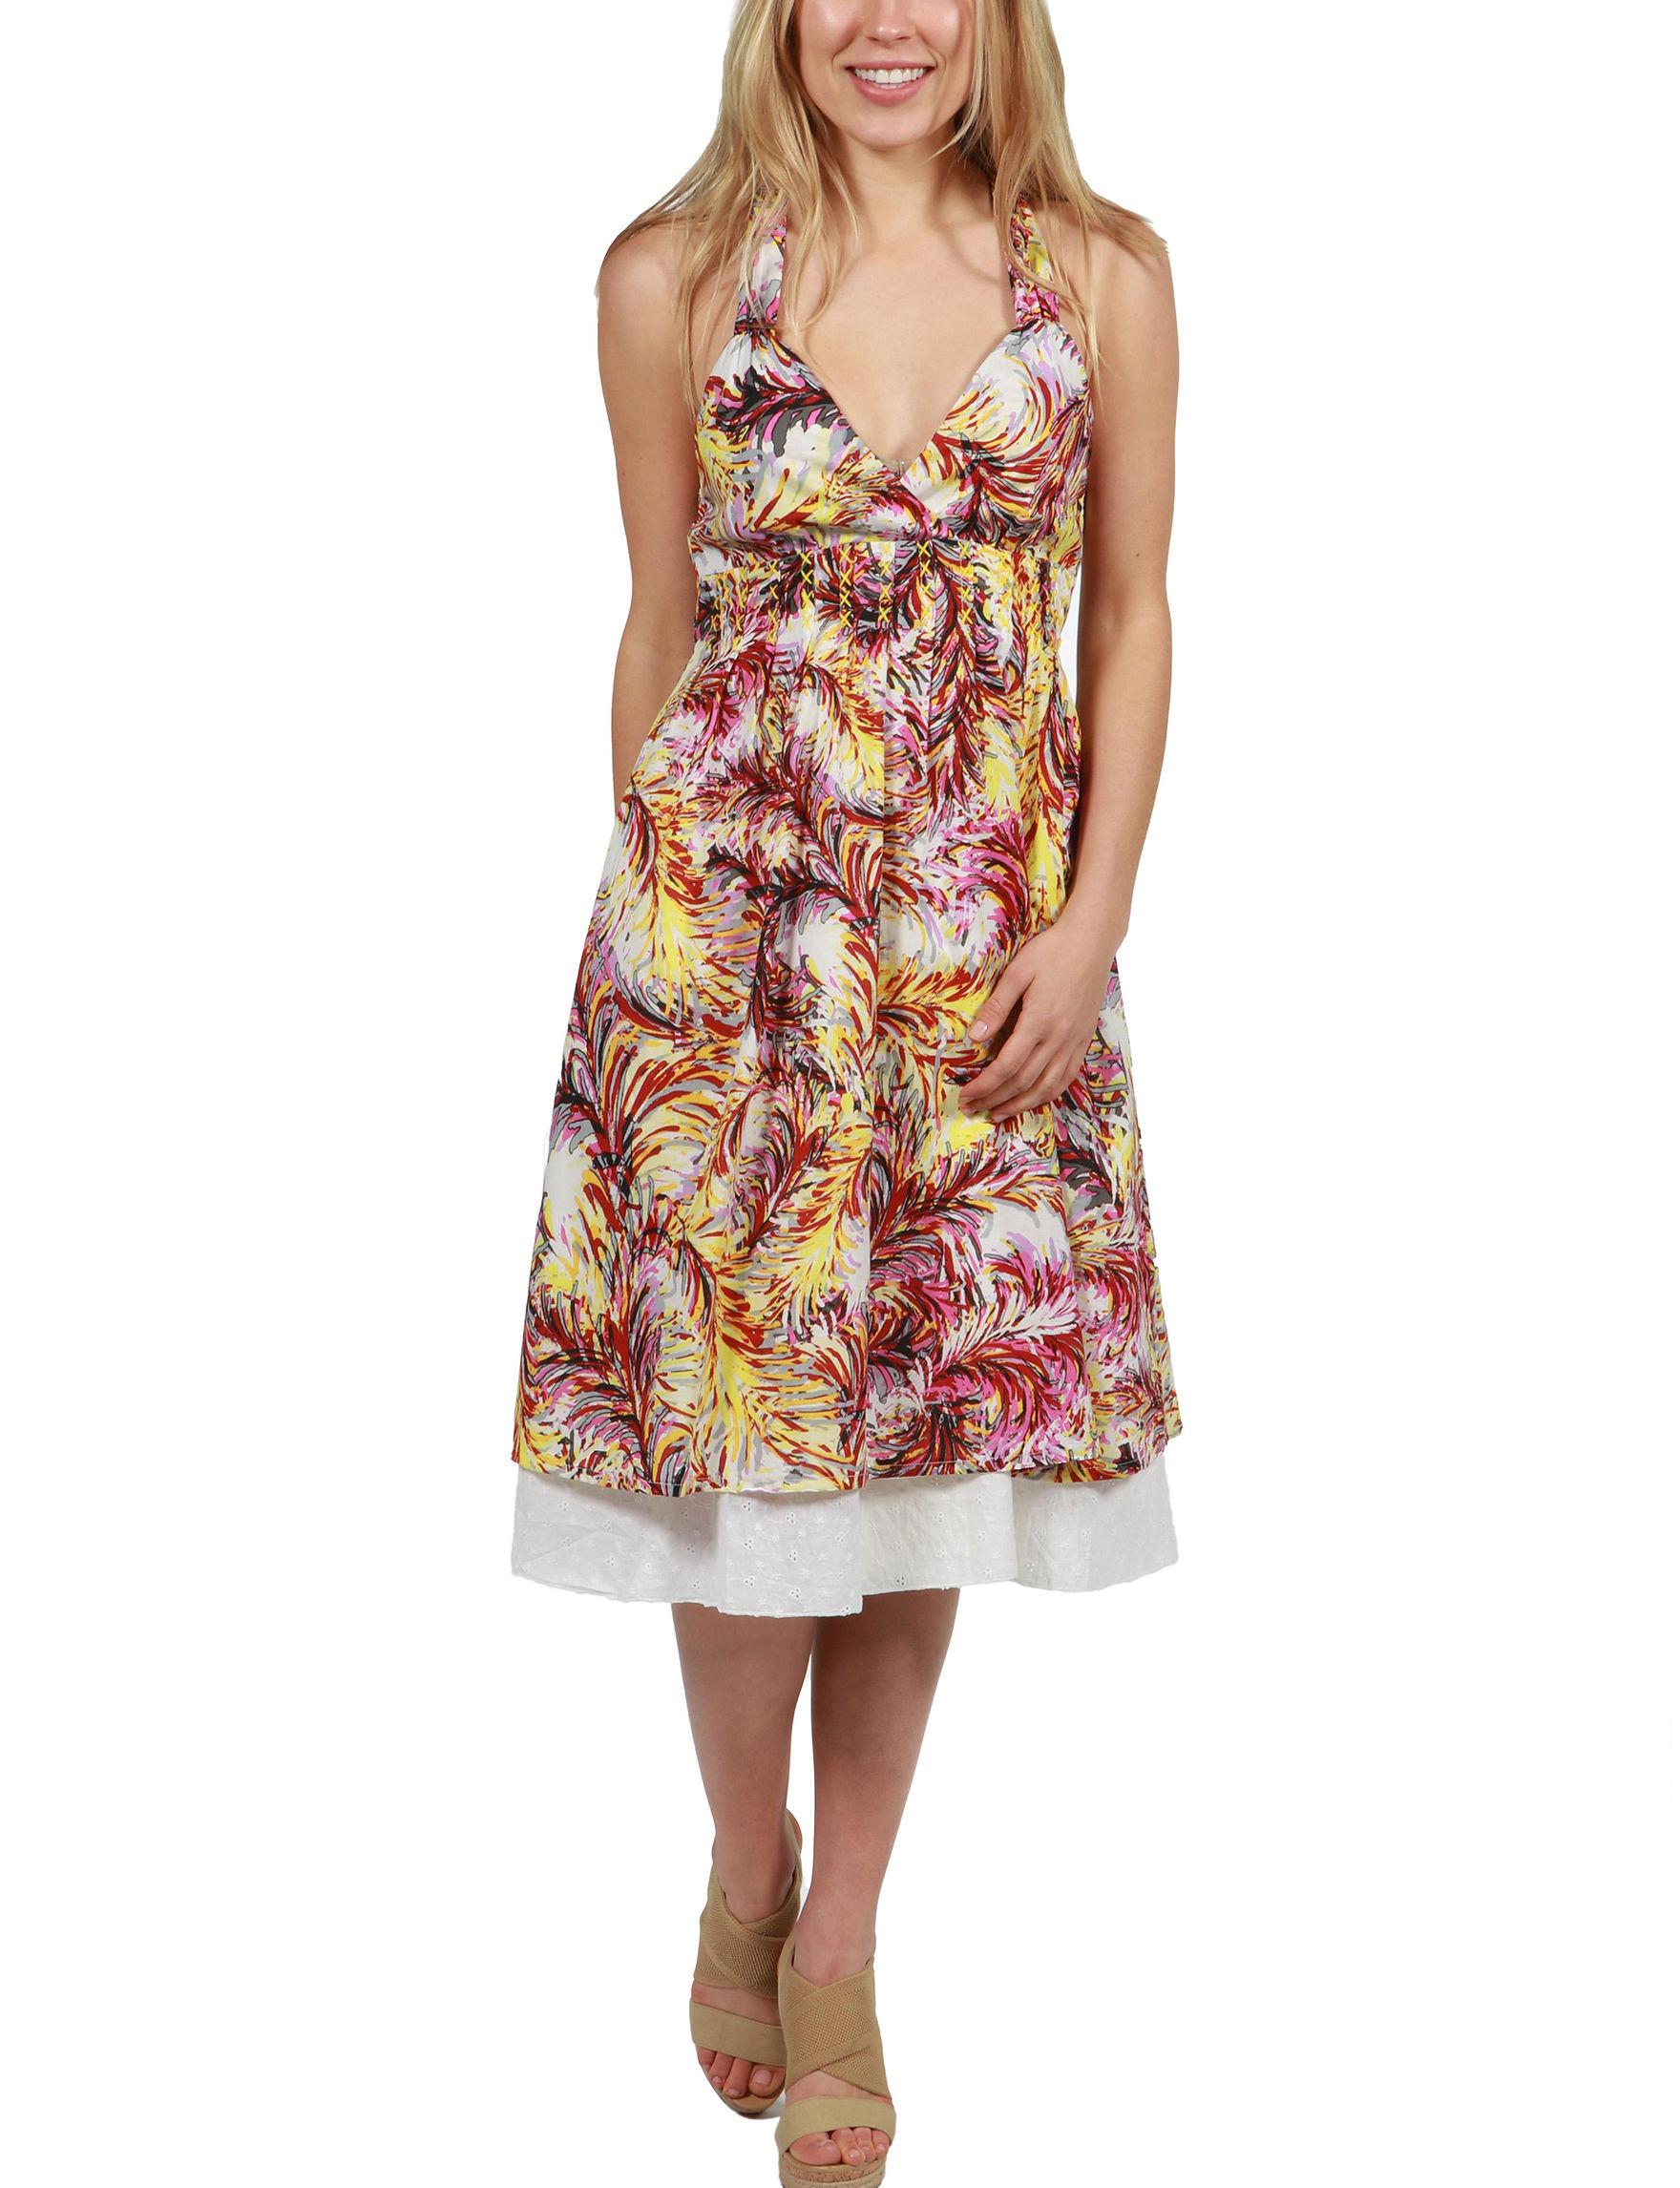 24Seven Comfort Apparel White Multi Everyday & Casual A-line Dresses Sundresses